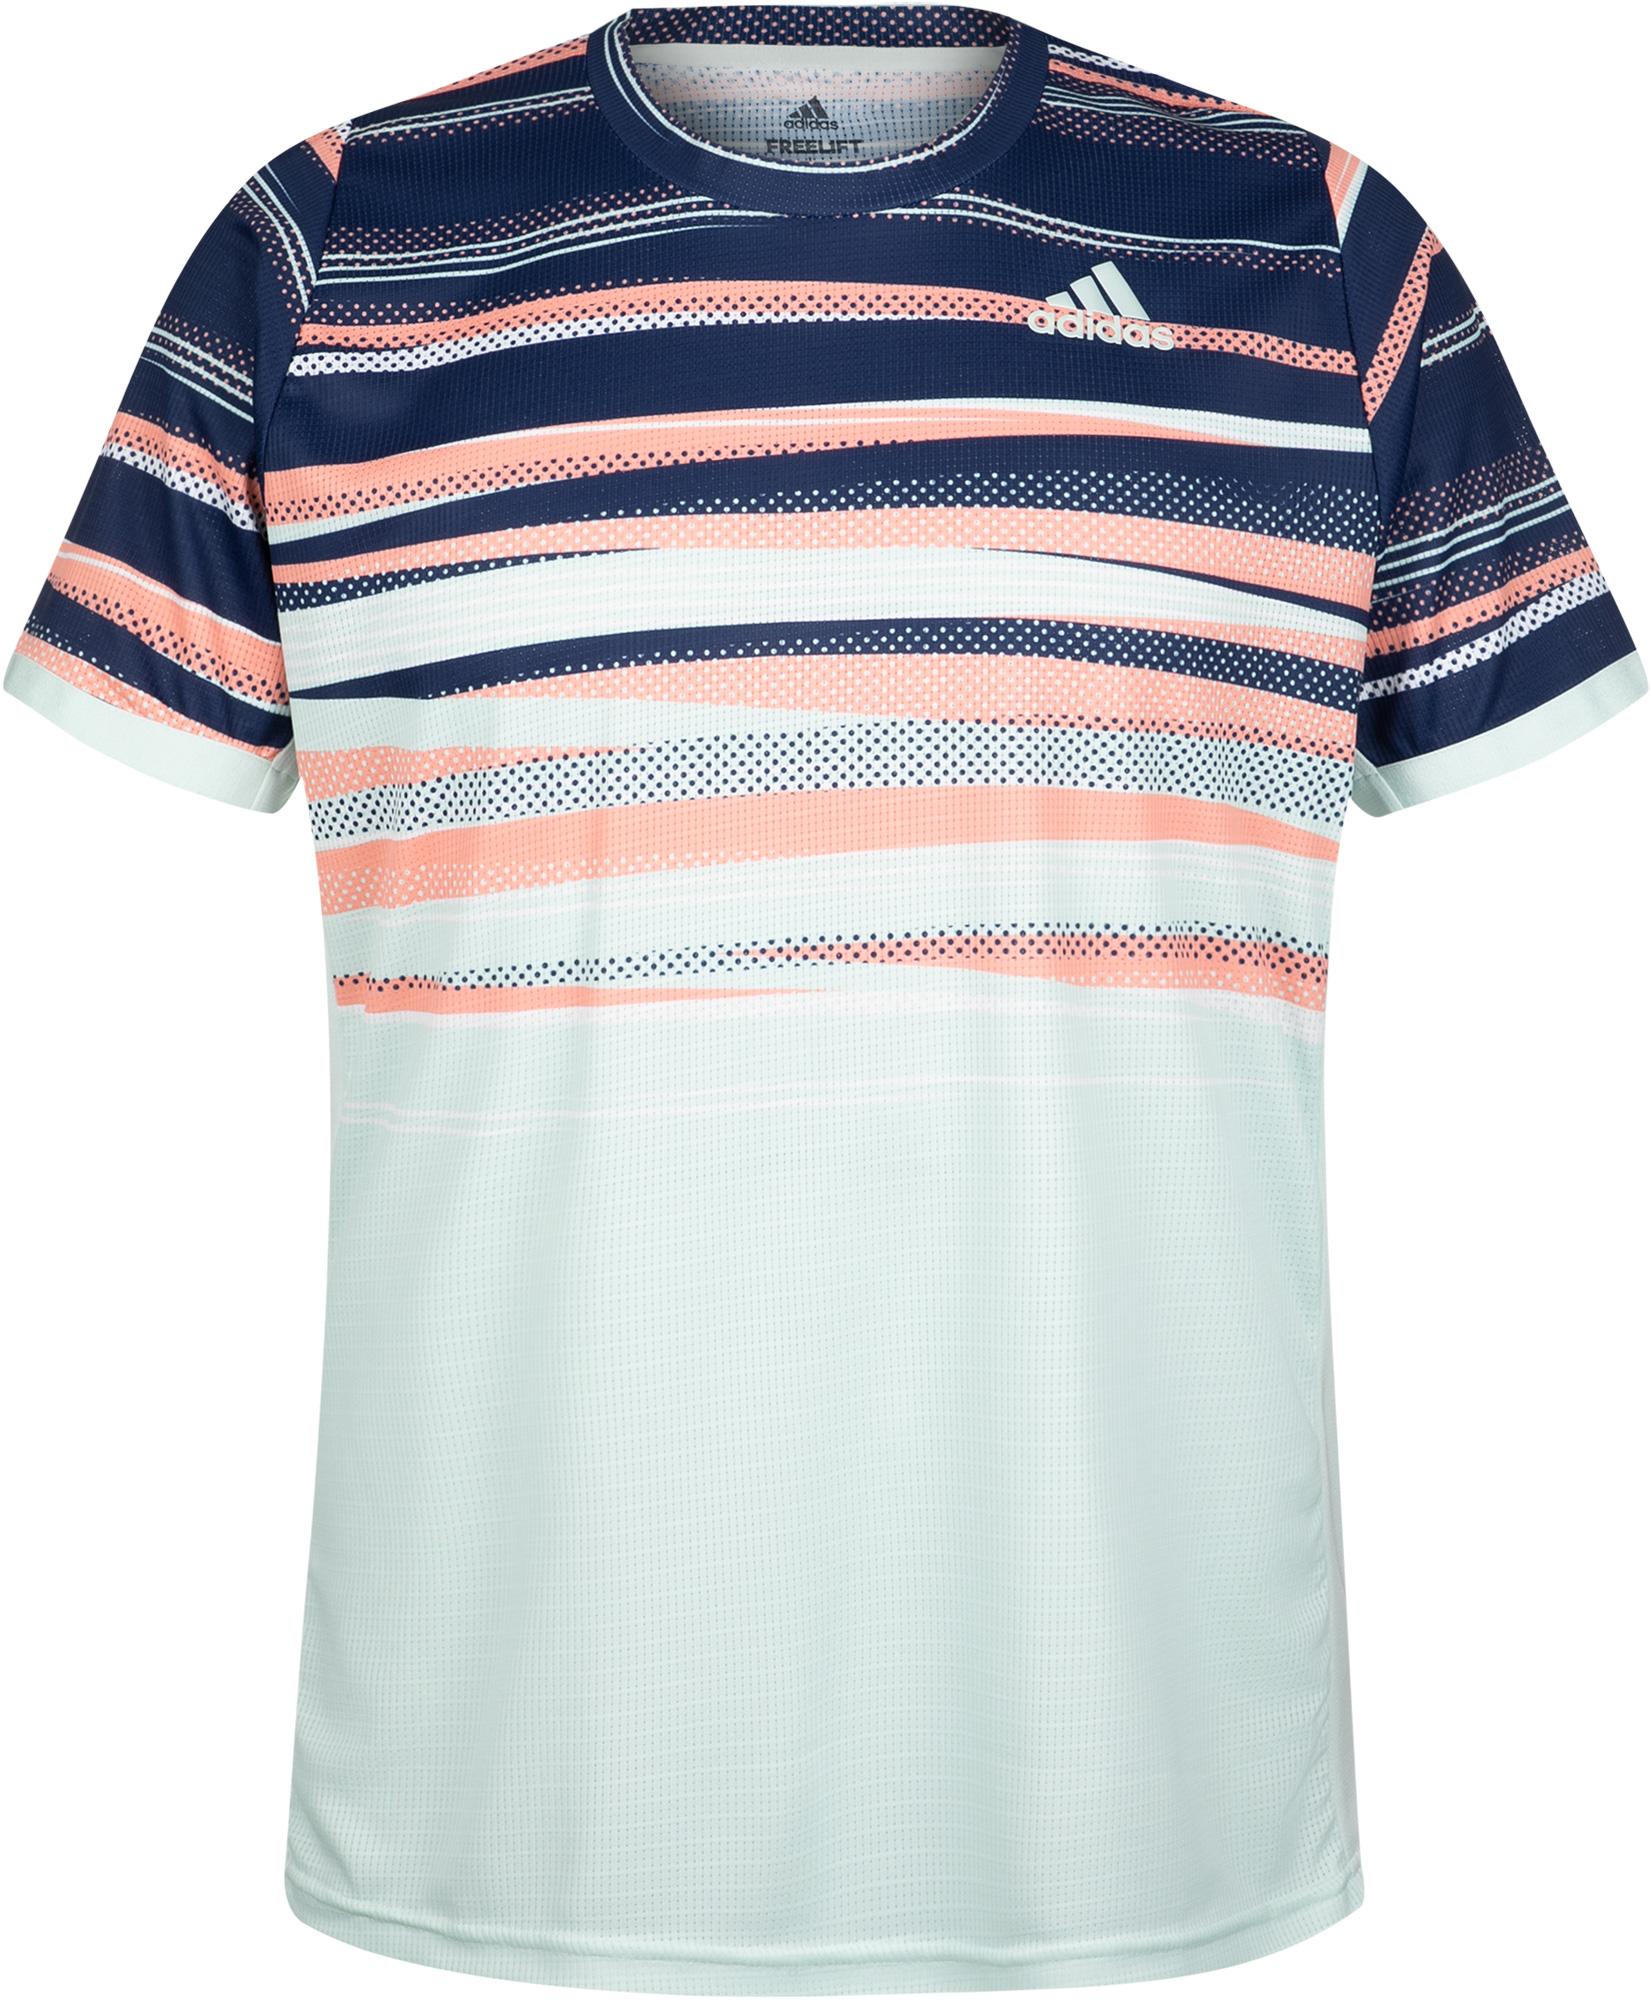 Adidas Футболка мужская Adidas, размер 44-46 adidas футболка freelift grad linkha